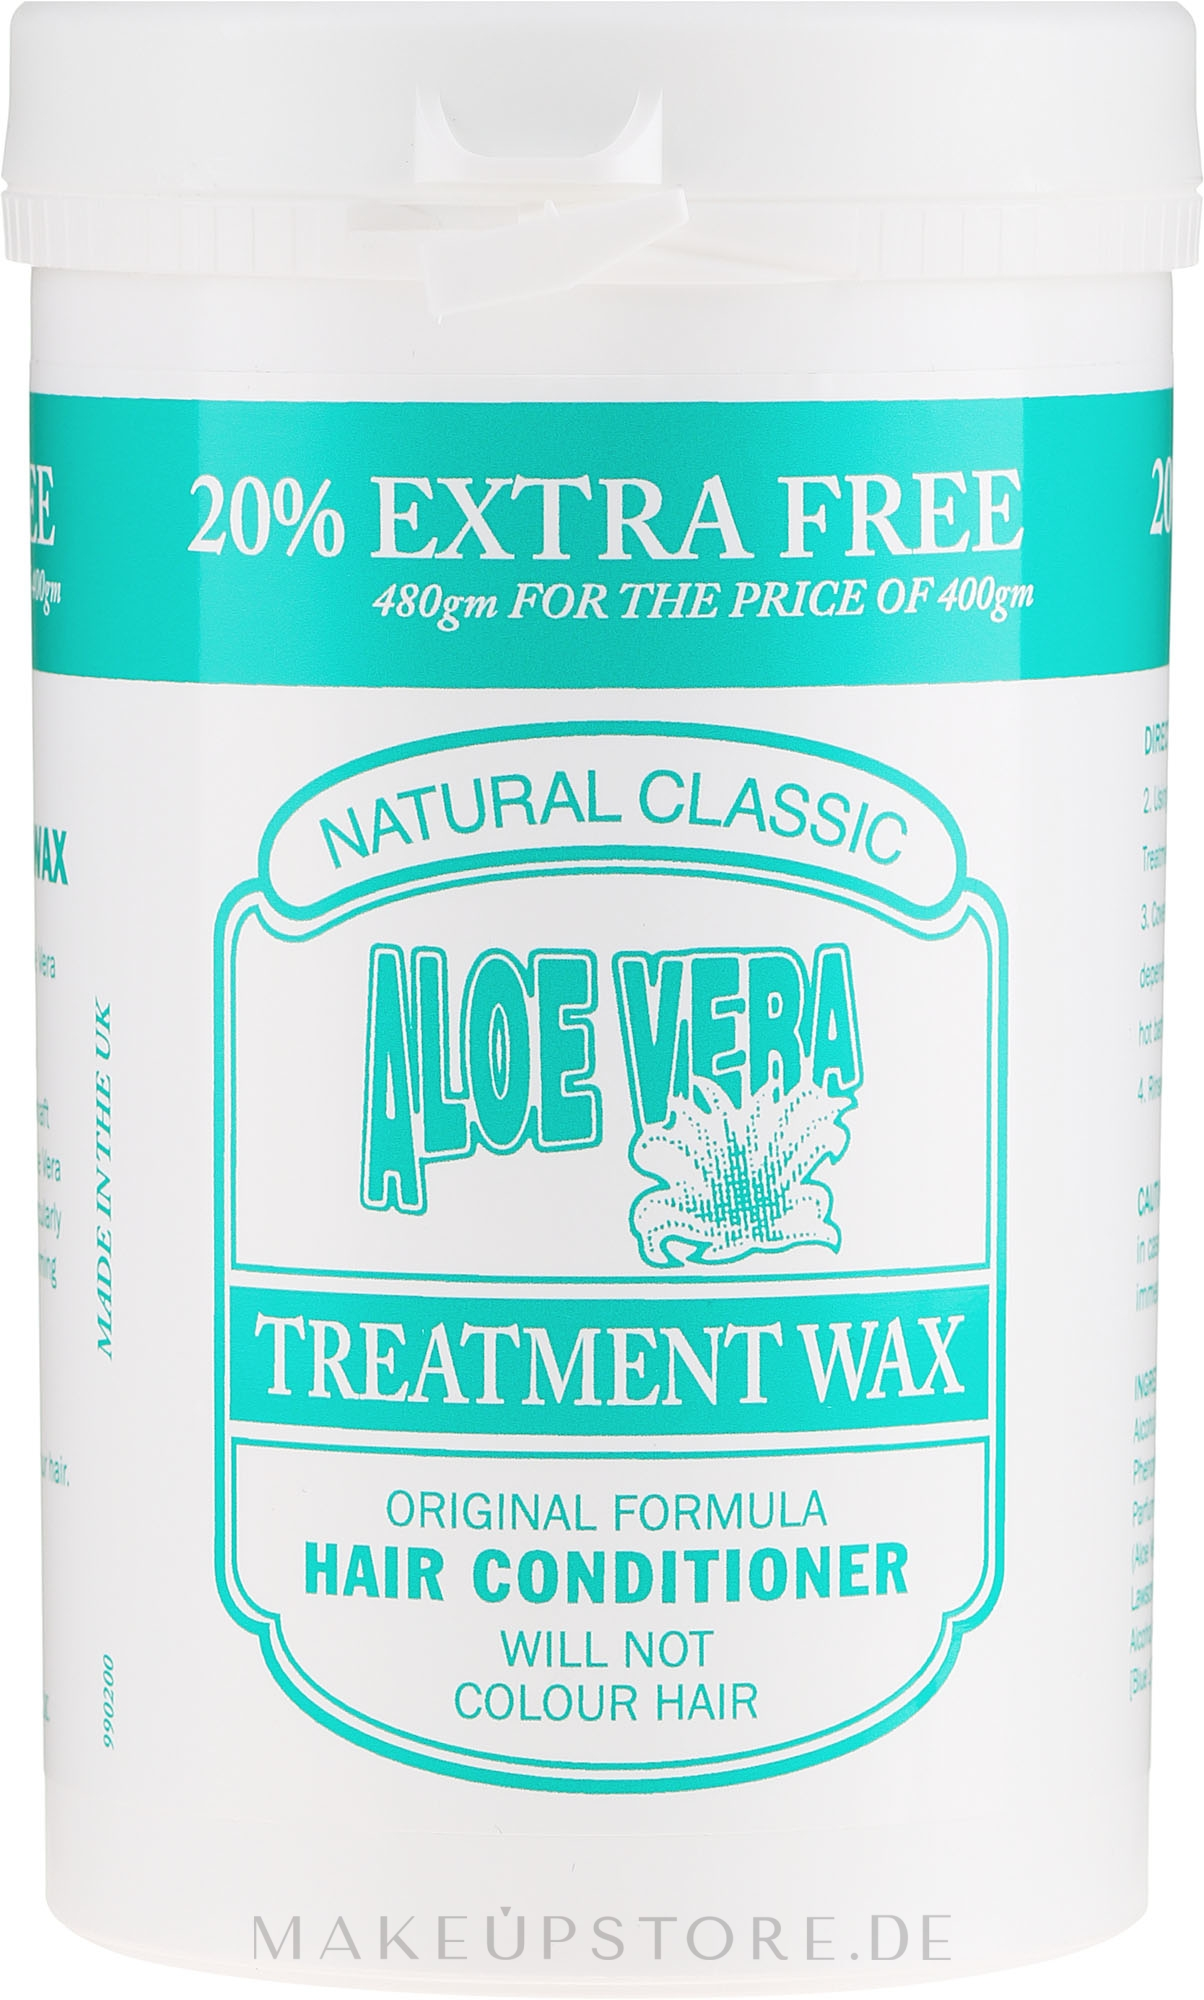 Haarspülung mit Aloe Vera - Natural Classic Aloe Vera — Bild 480 g